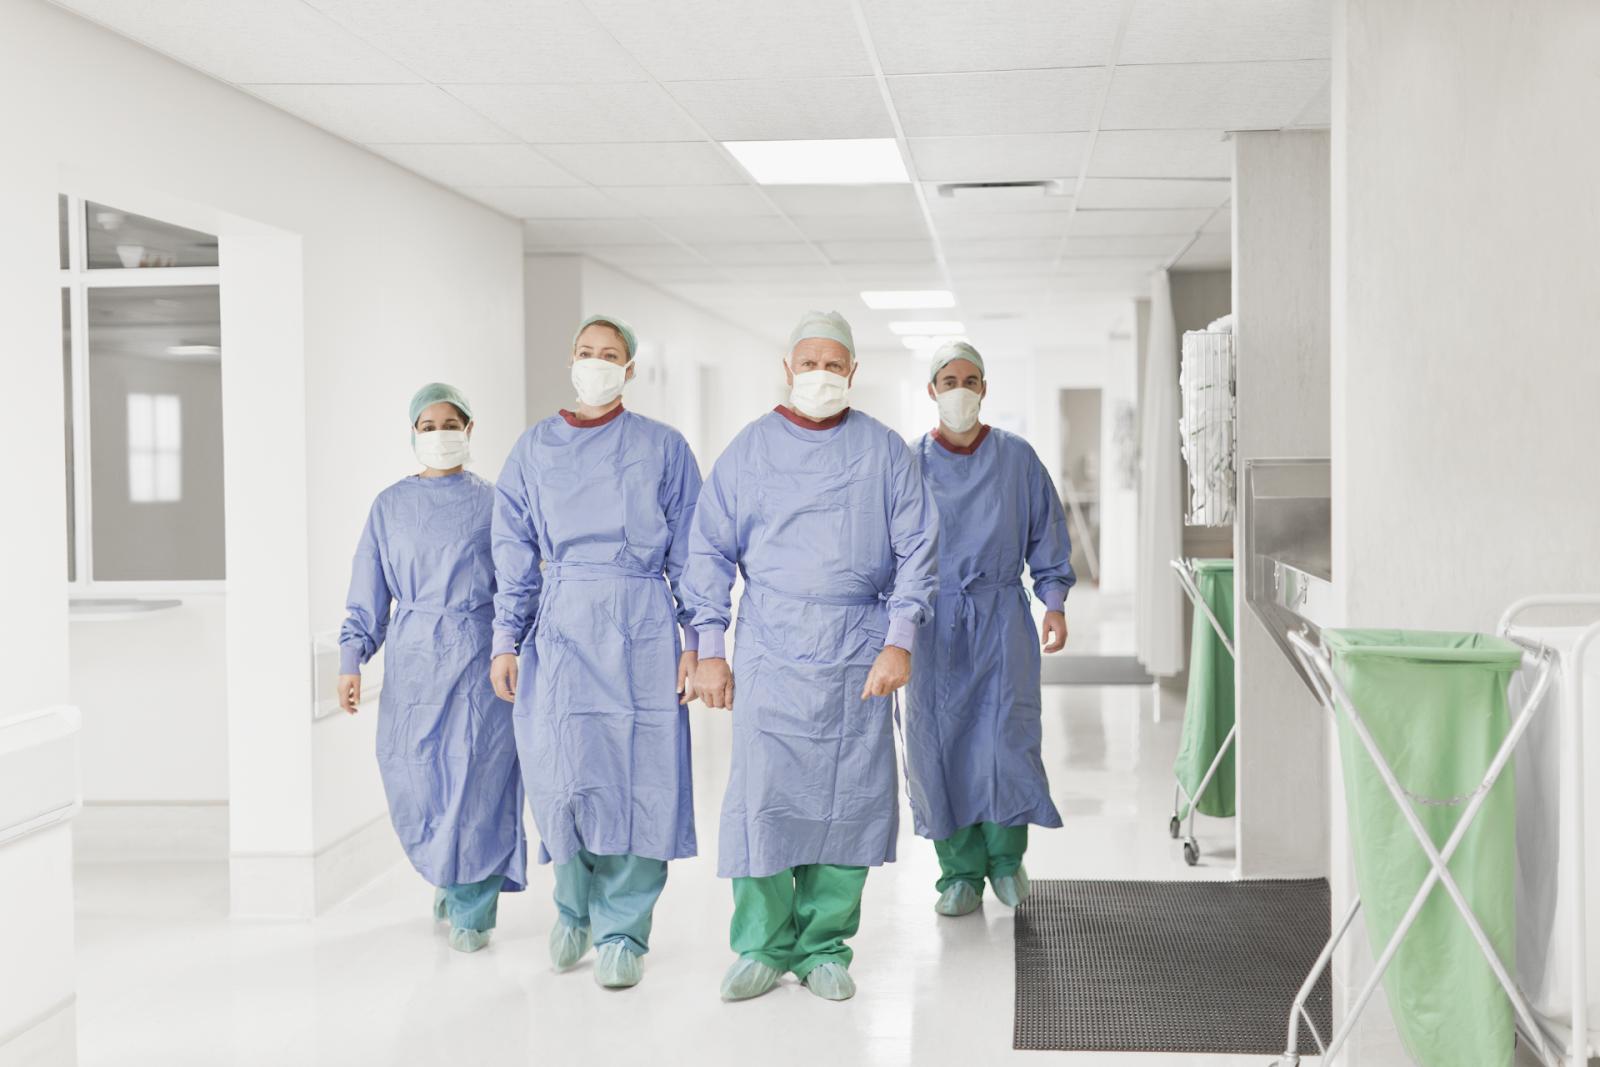 team of surgeons walking down hospital hallway